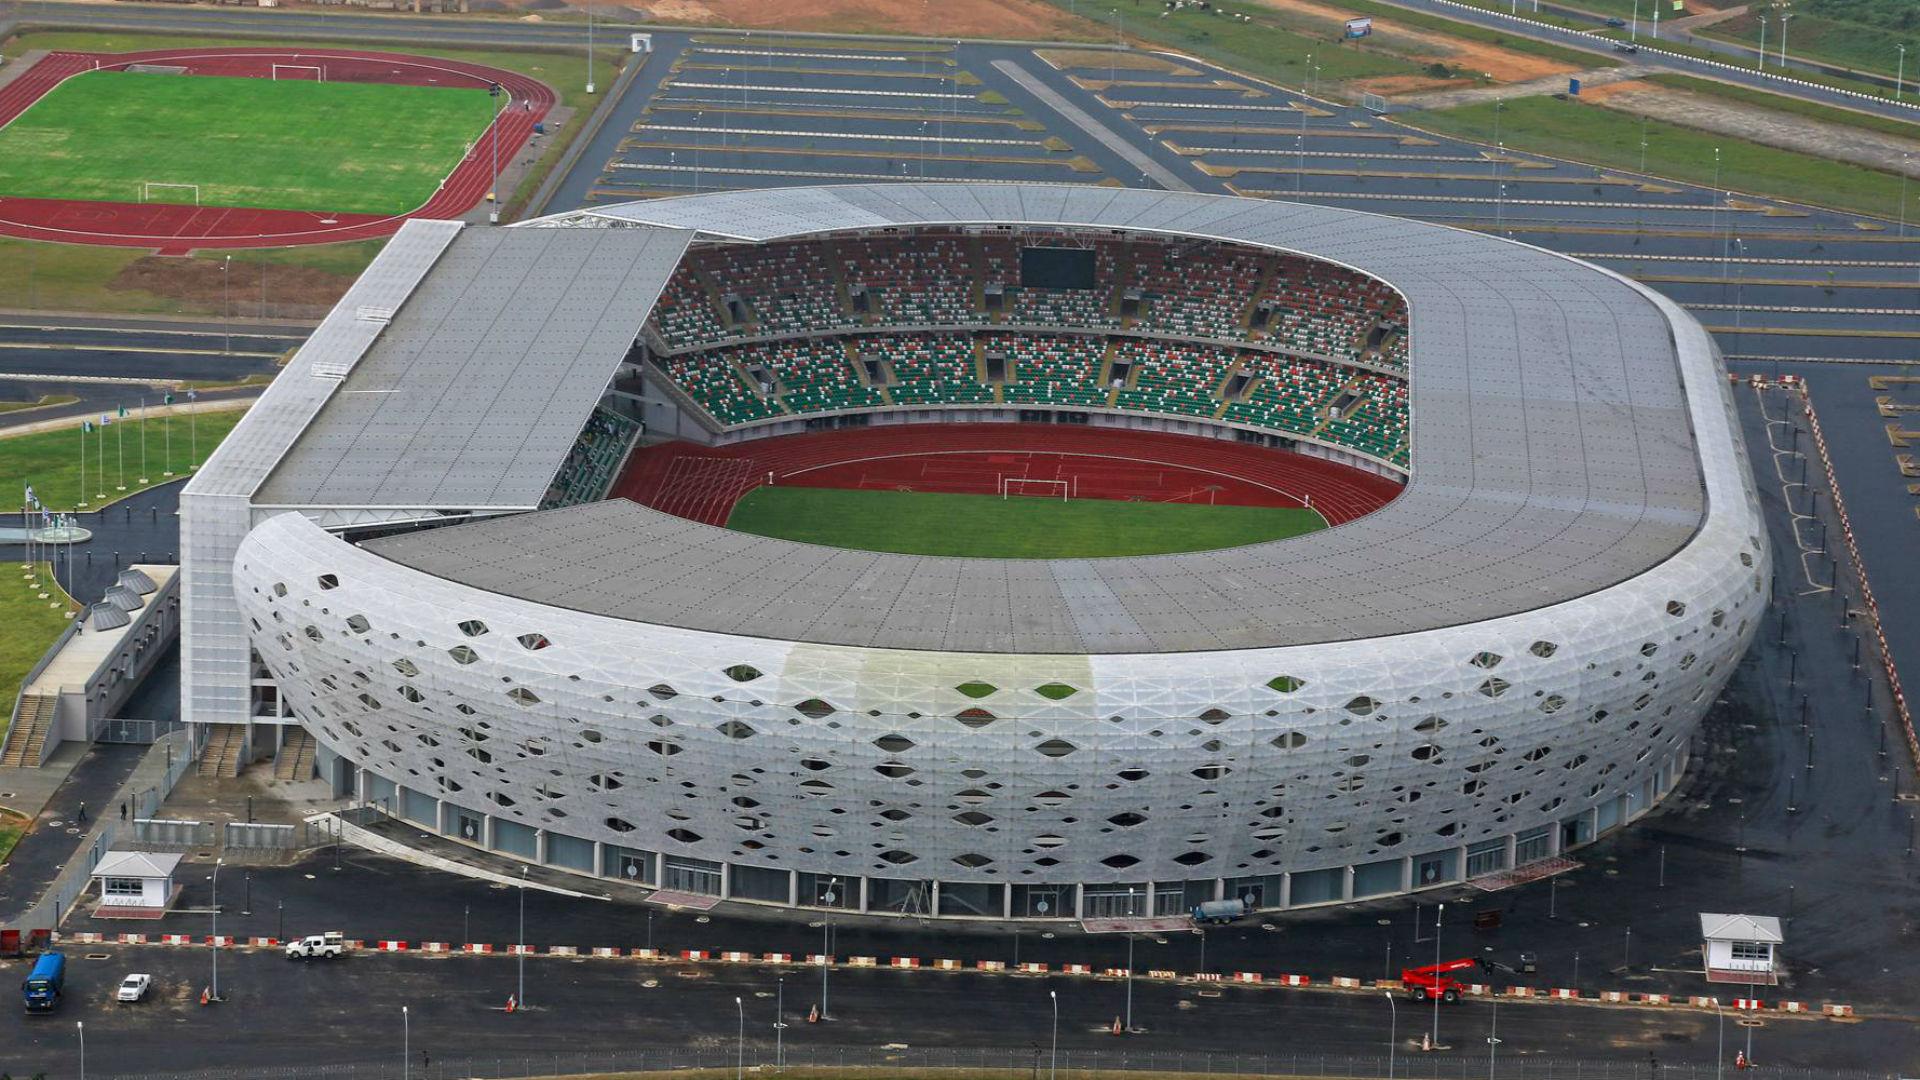 Godswill Akpabio Stadium